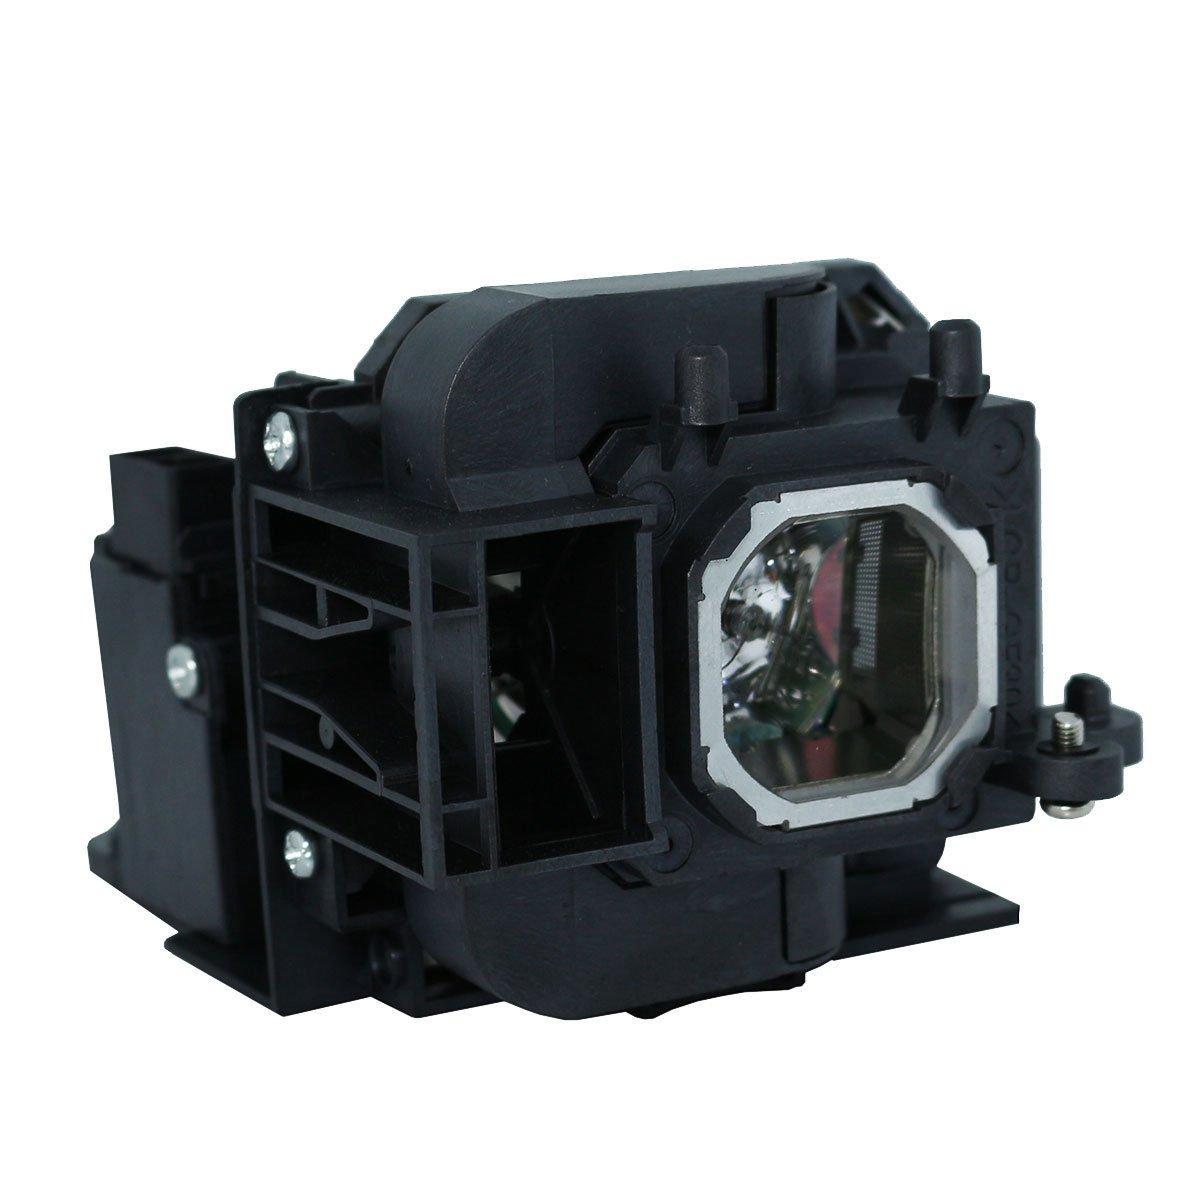 kingoo優れたプロジェクターランプfor NEC np-p451 X np23lp 100013284用交換プロジェクターランプ電球ハウジング   B07CS26RXH